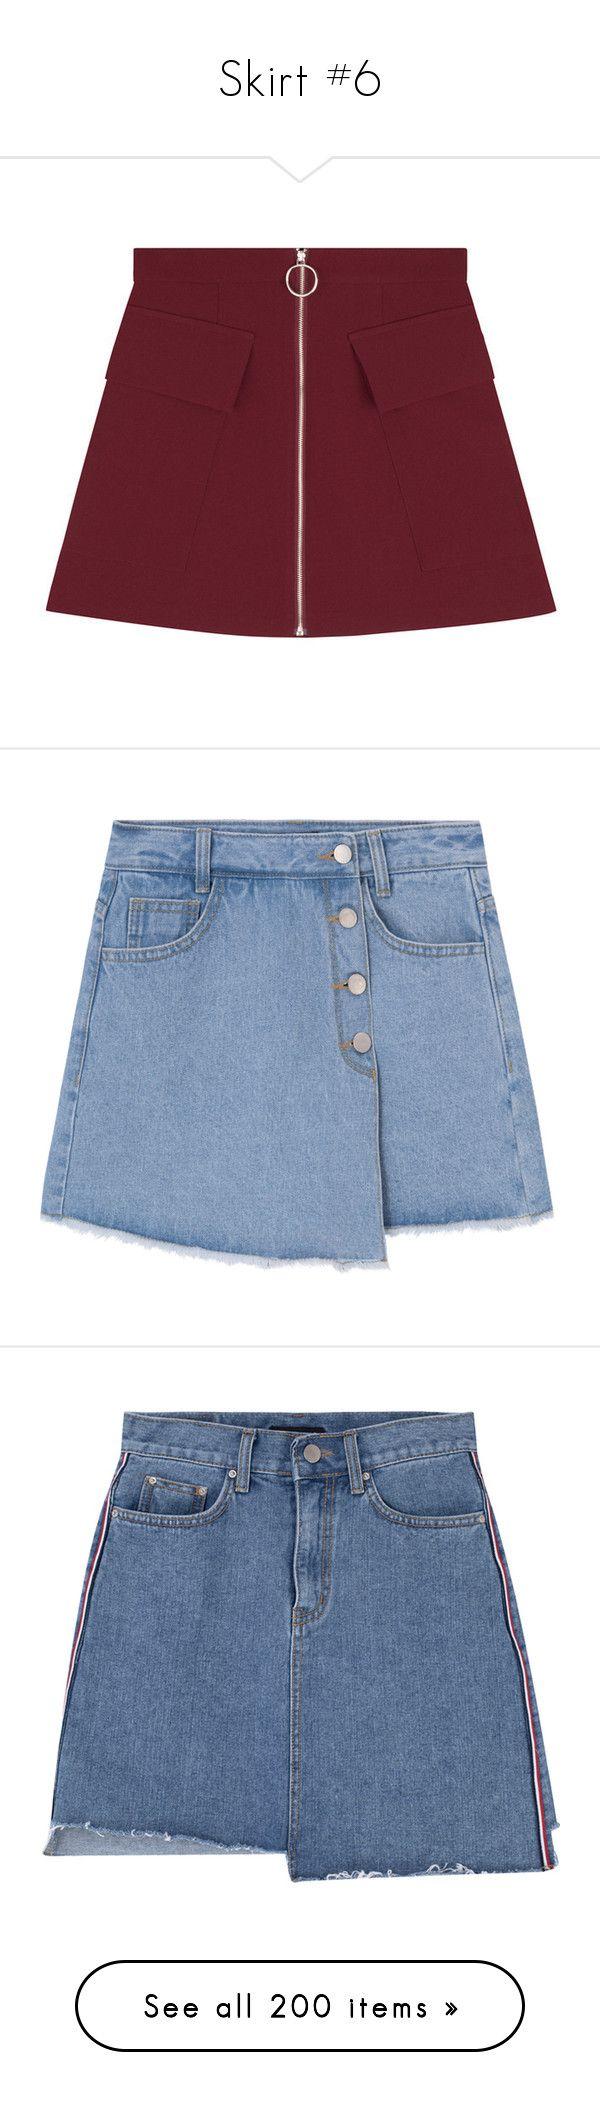 """Skirt #6"" by li-nctzen ❤ liked on Polyvore featuring skirts, mini skirts, bottoms, clothing - skirts, red circle skirt, a-line skirt, short a line skirt, short skirts, velvet a line skirt and high waisted denim skirt"